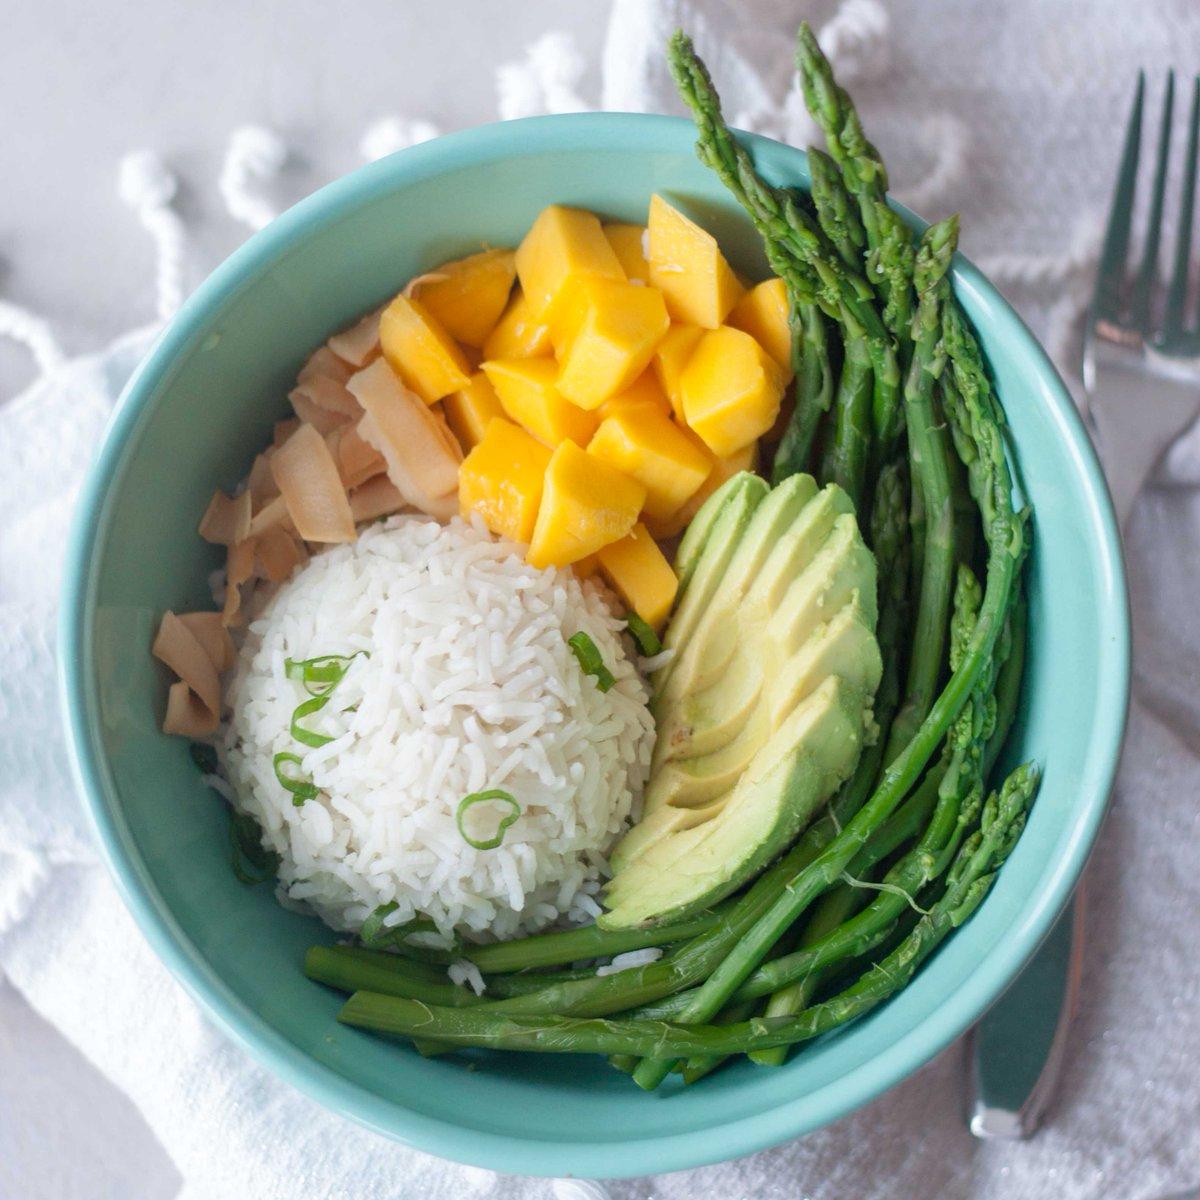 Asparagus Avocado Mango Rice Bowls for quick and #healthy dinner tonight!  https:// awhiskandtwowands.com/asparagus-avoc ado-mango-rice-bowl/ &nbsp; …  #MeatlessMonday #plantbased #glutenfree @MeatlessMonday<br>http://pic.twitter.com/BIYxKeQNTu